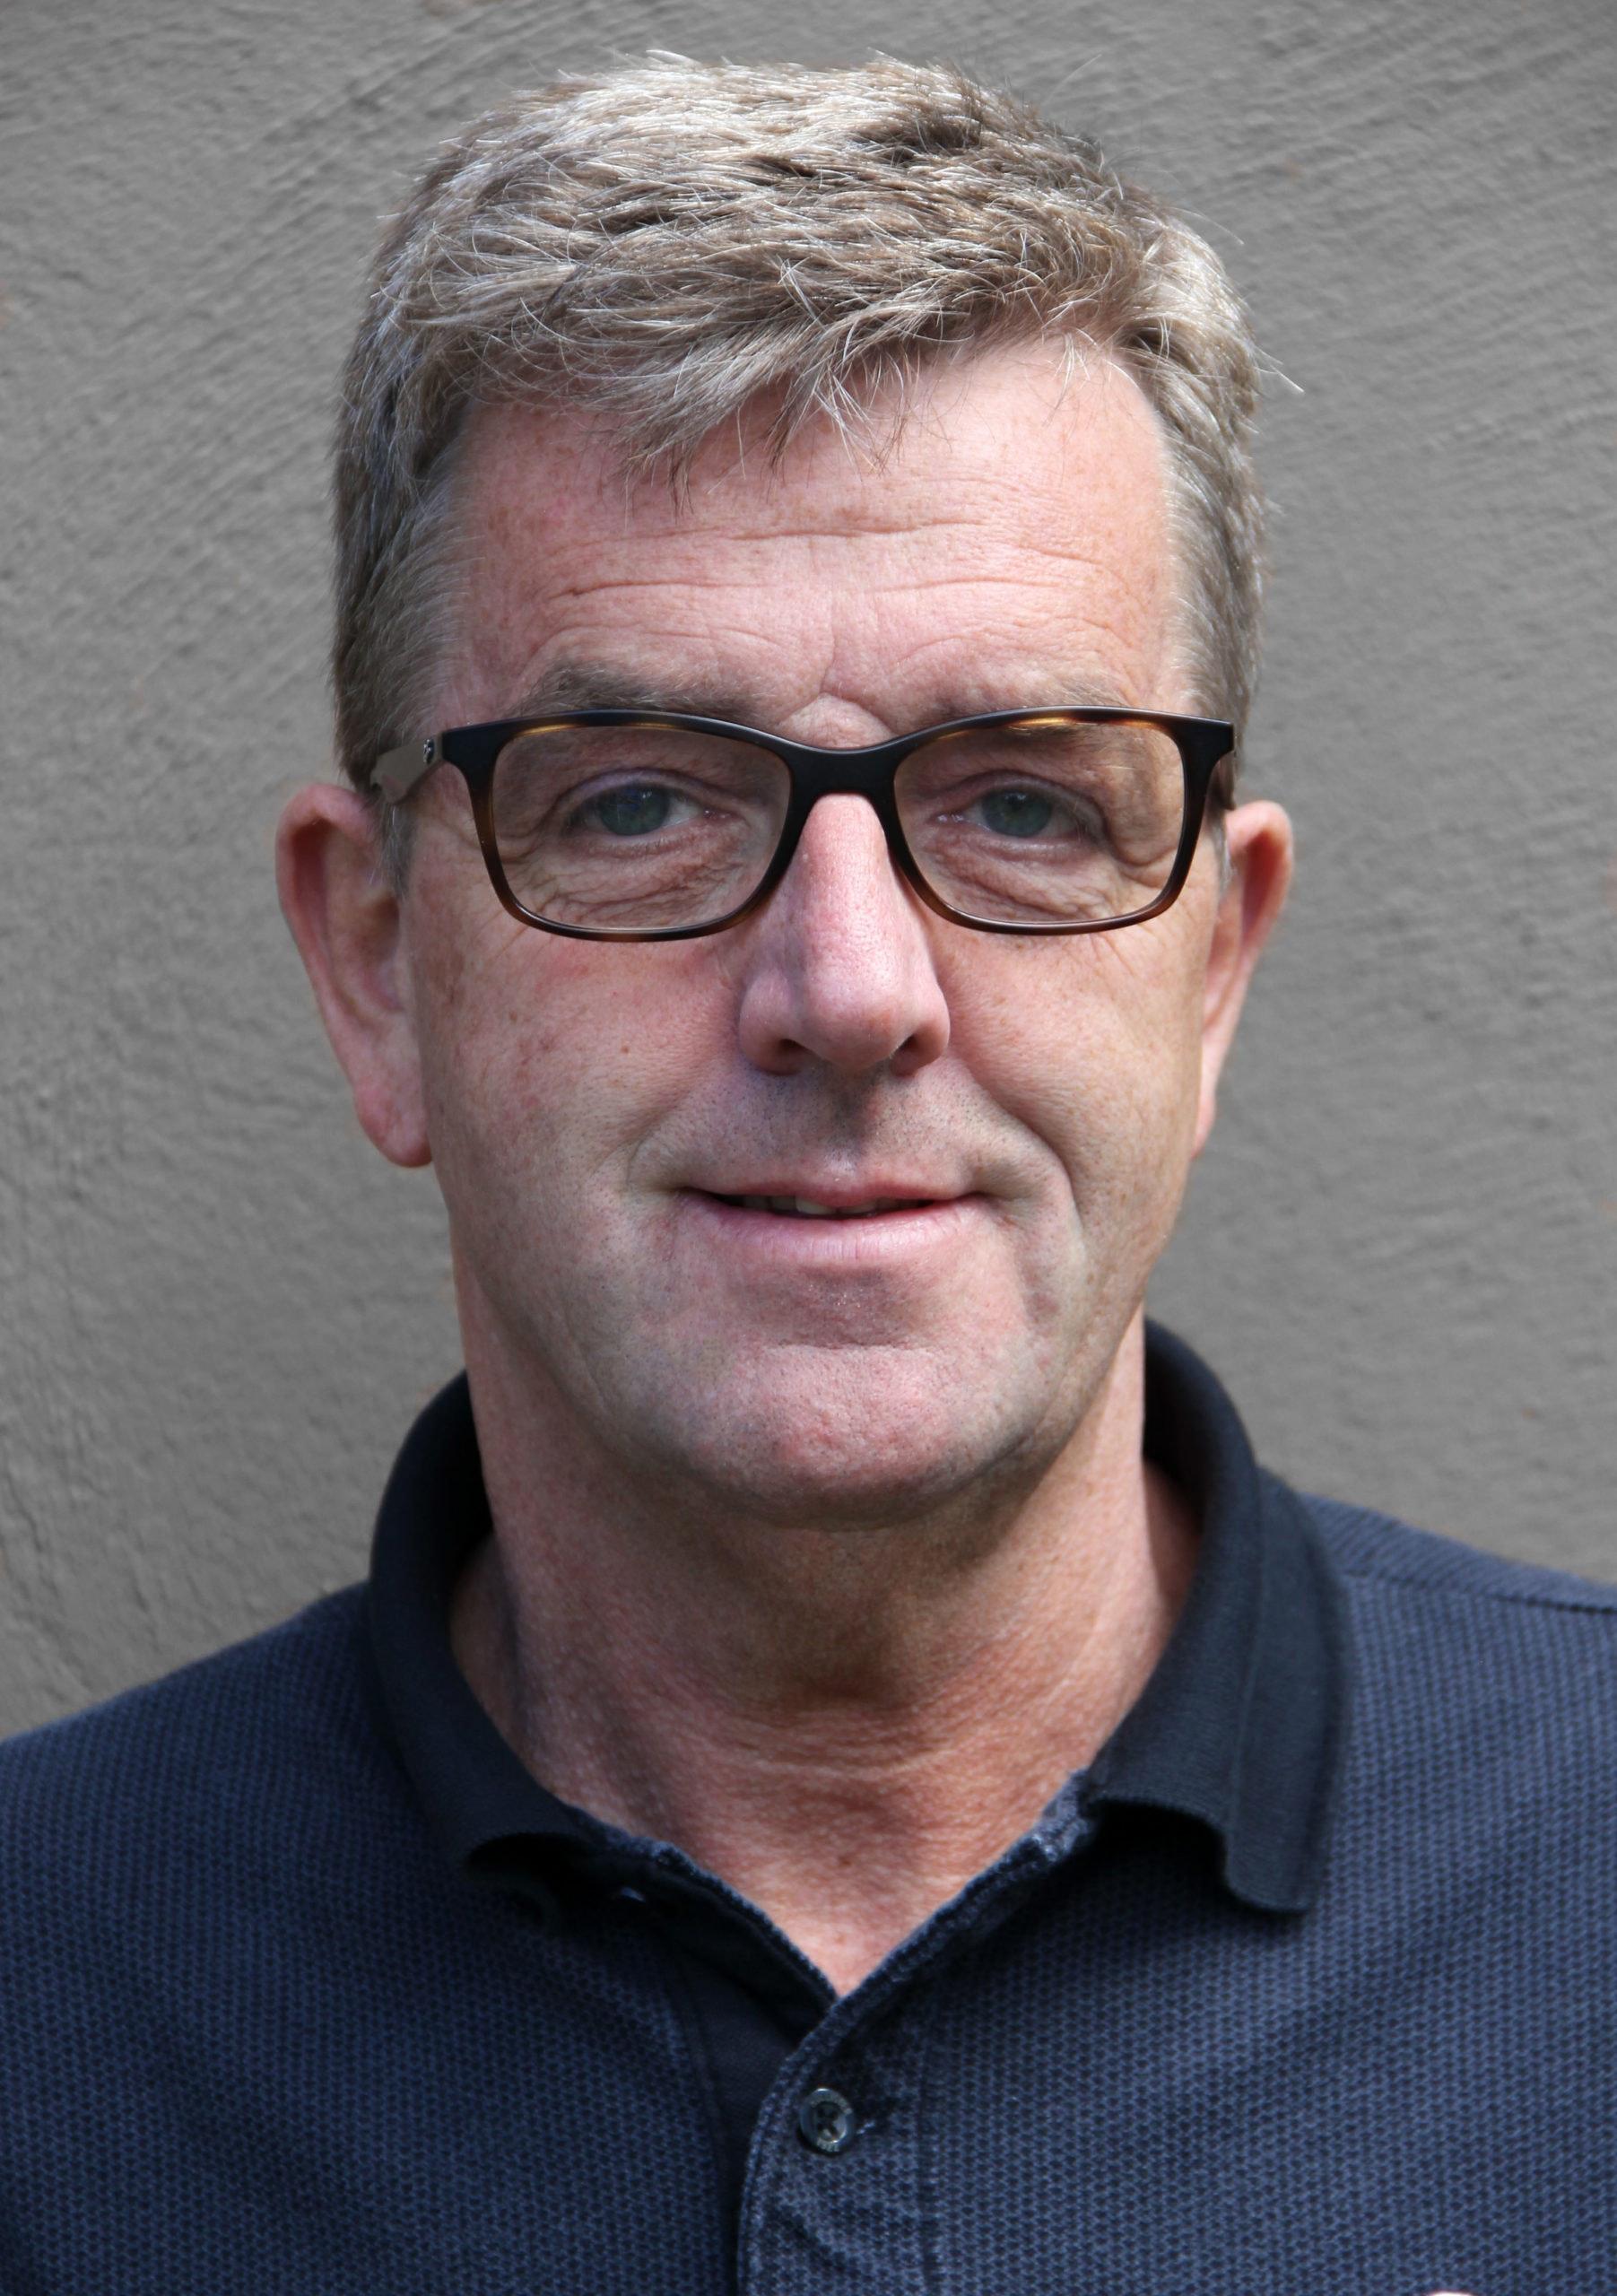 Ian Lowry